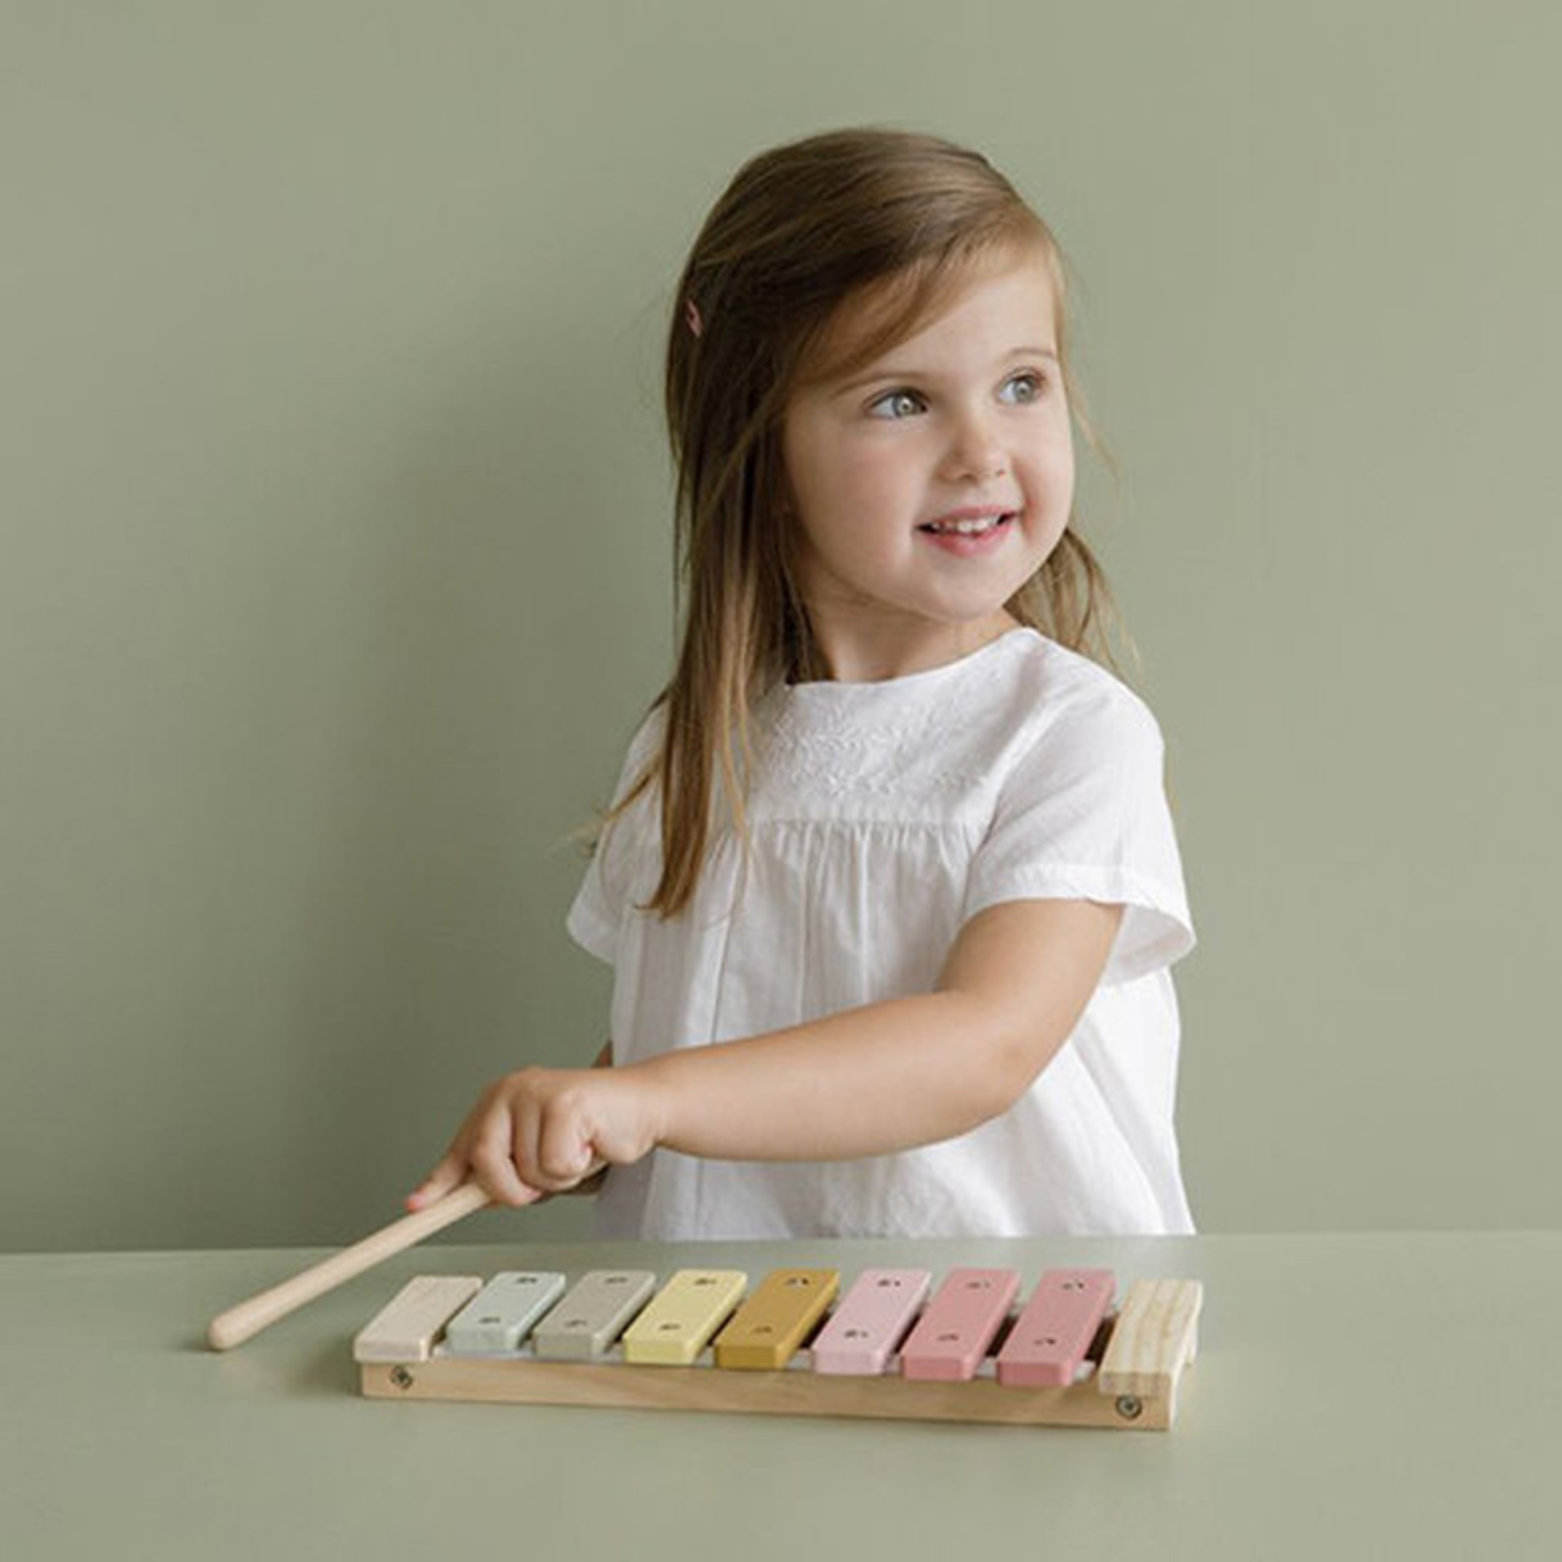 LD 7016 Xylophone Pink 3